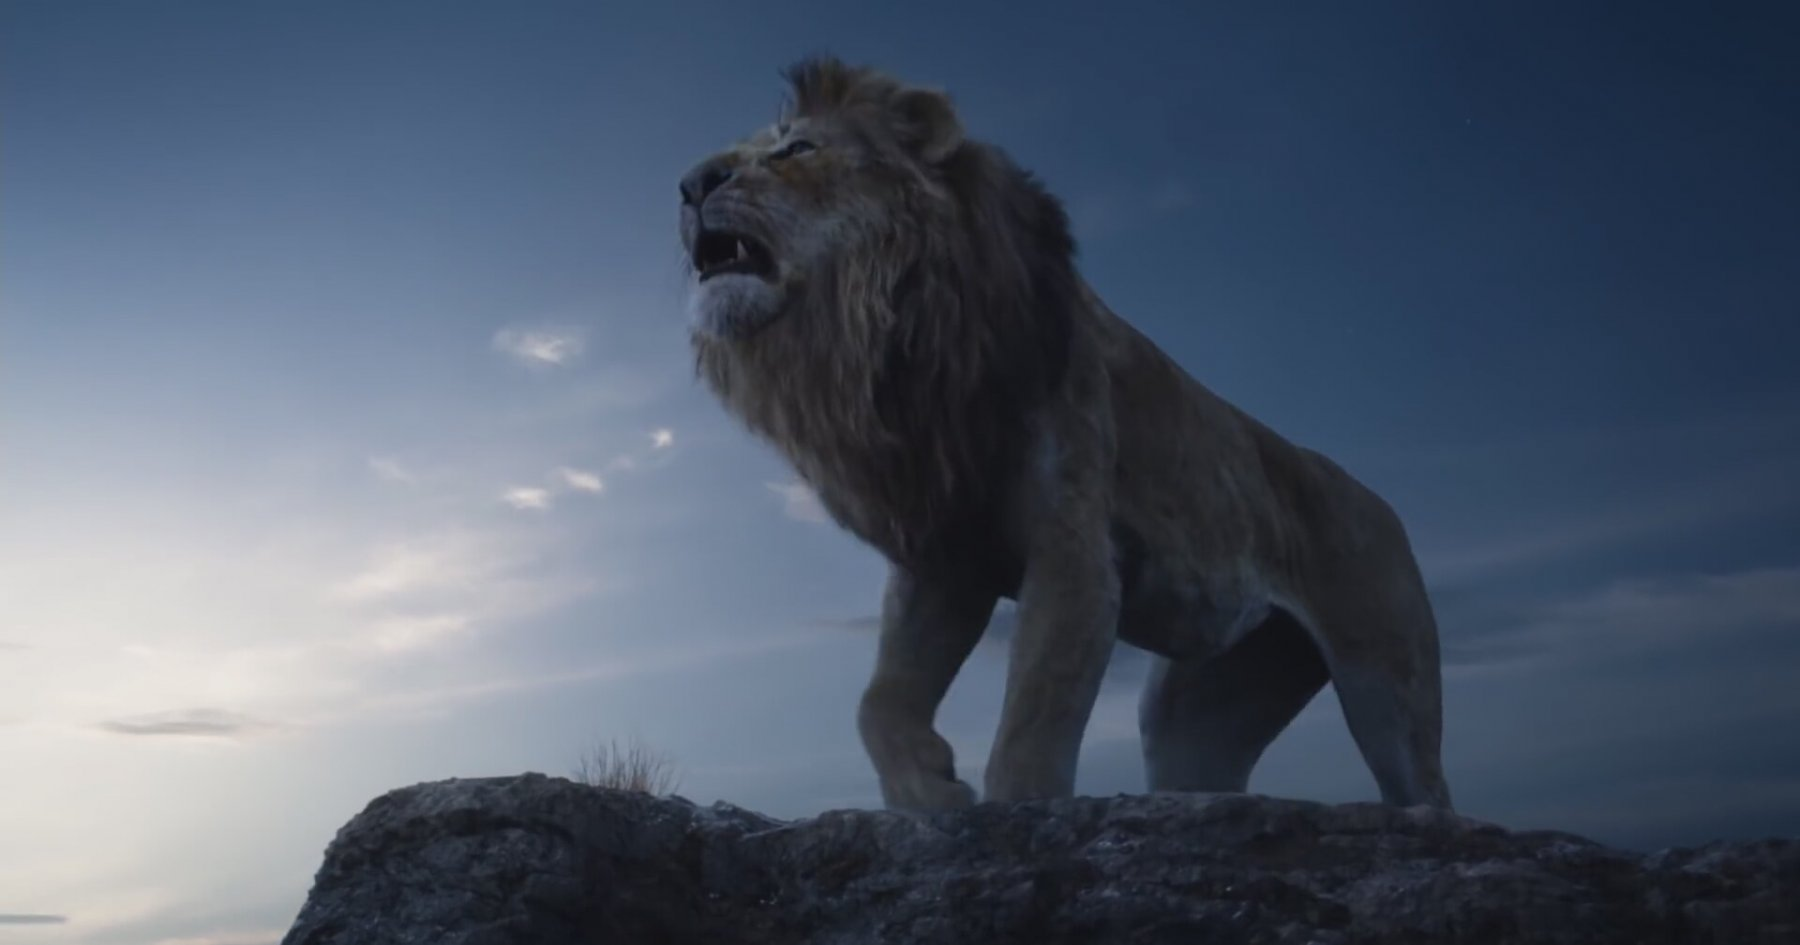 lion king 2019 - photo #9